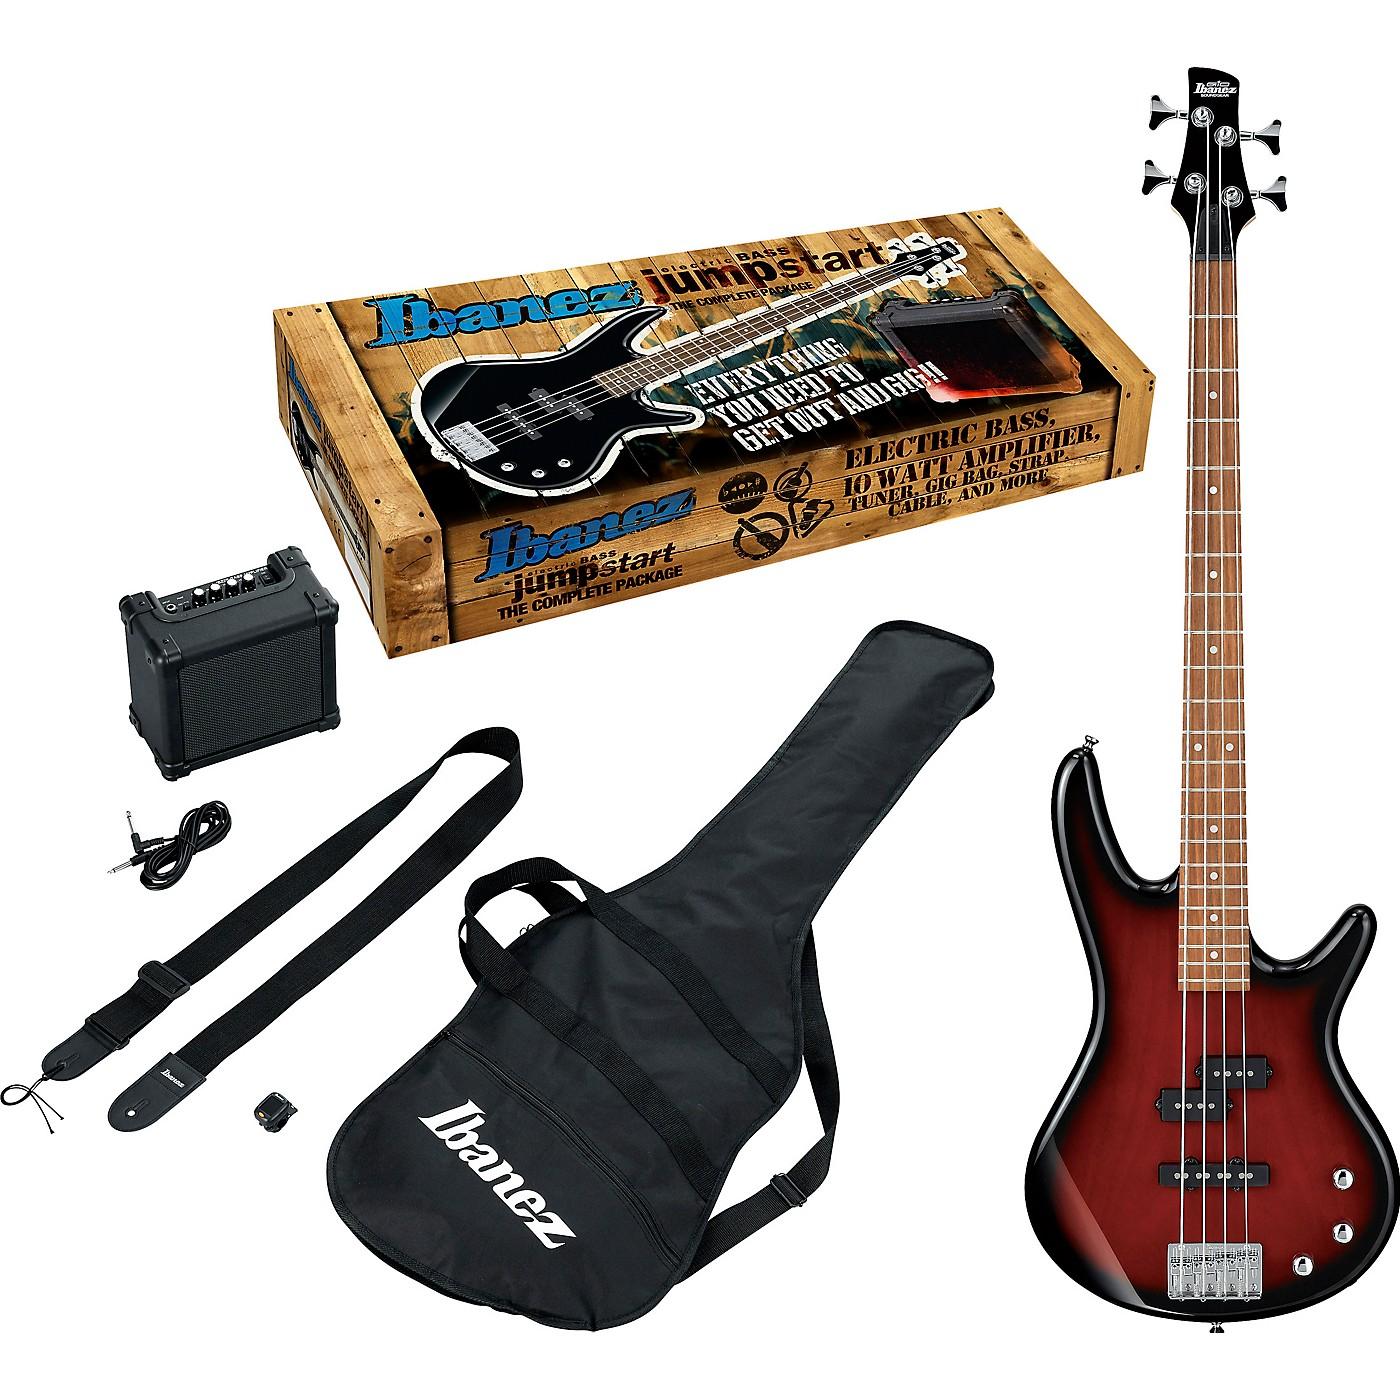 Ibanez Ibanez IJSR190N Electric Bass Jumpstart Pack thumbnail